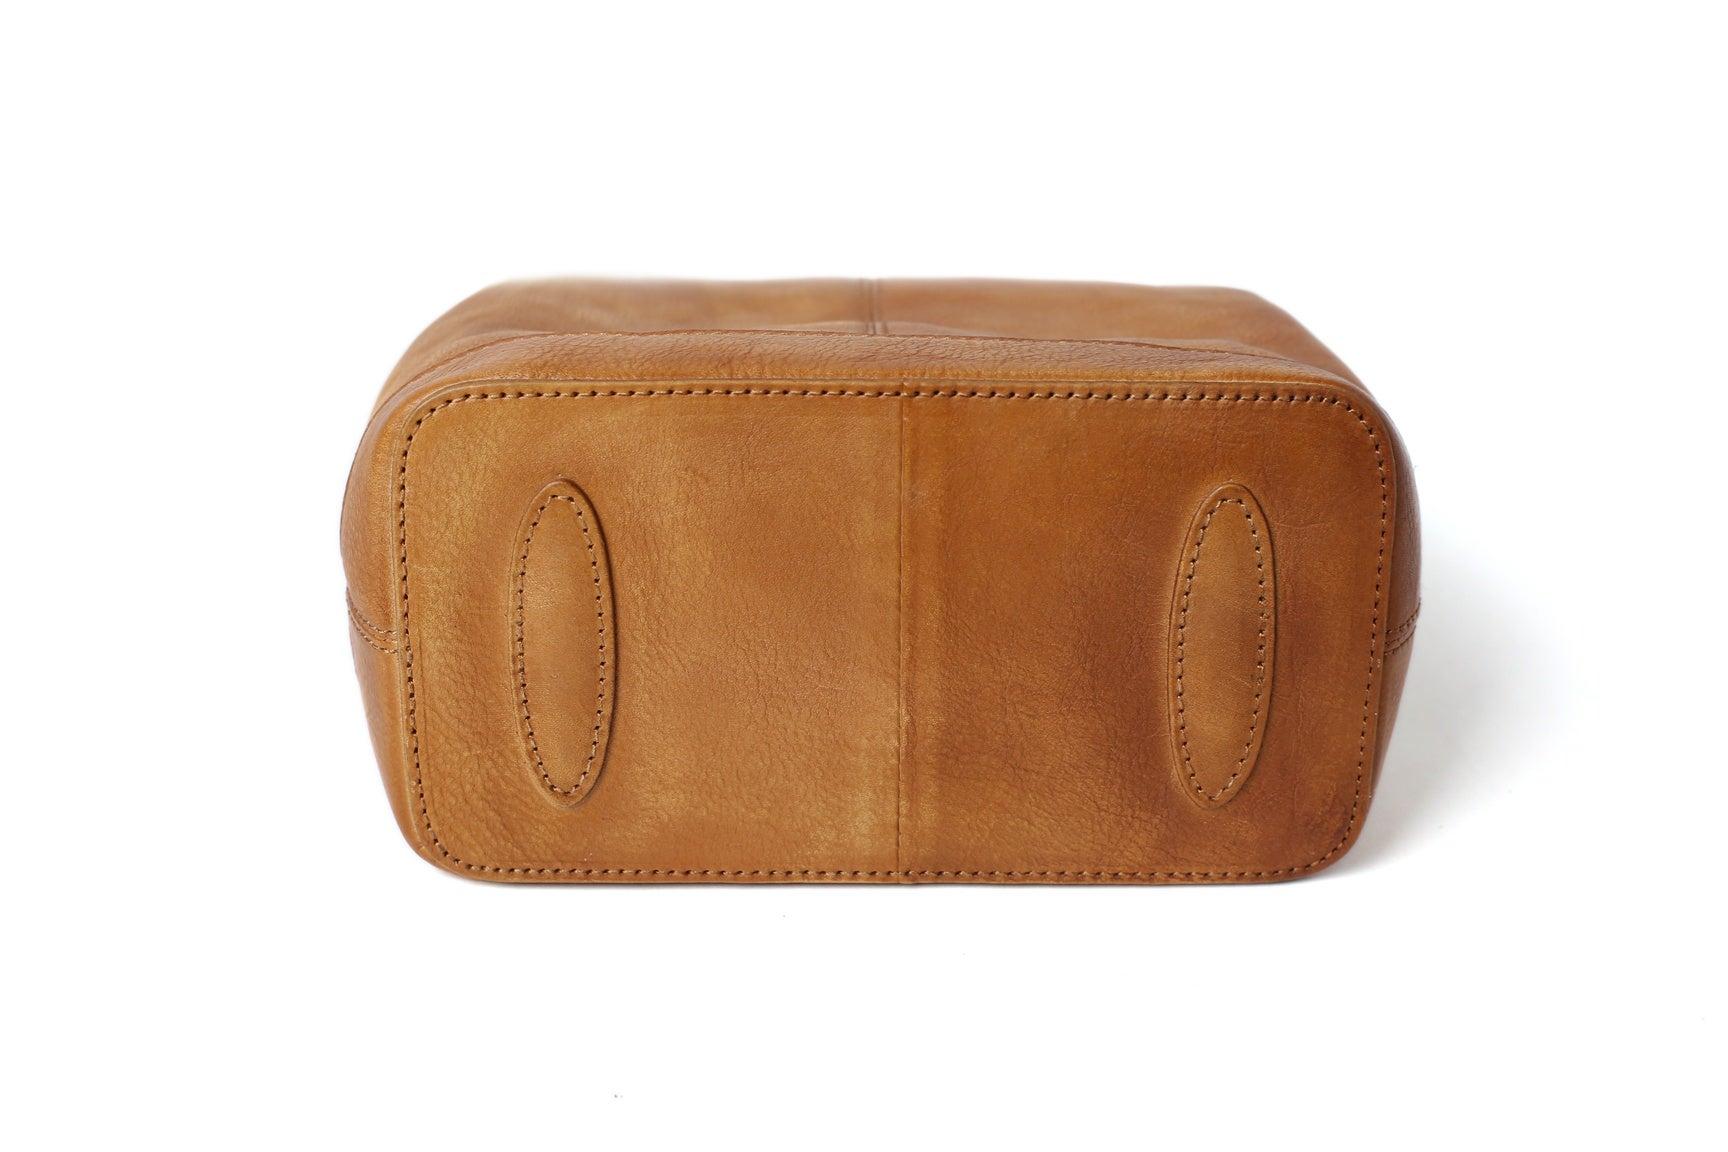 MoshiLeatherBag - Handmade Leather Bag Manufacturer — Handmade ...